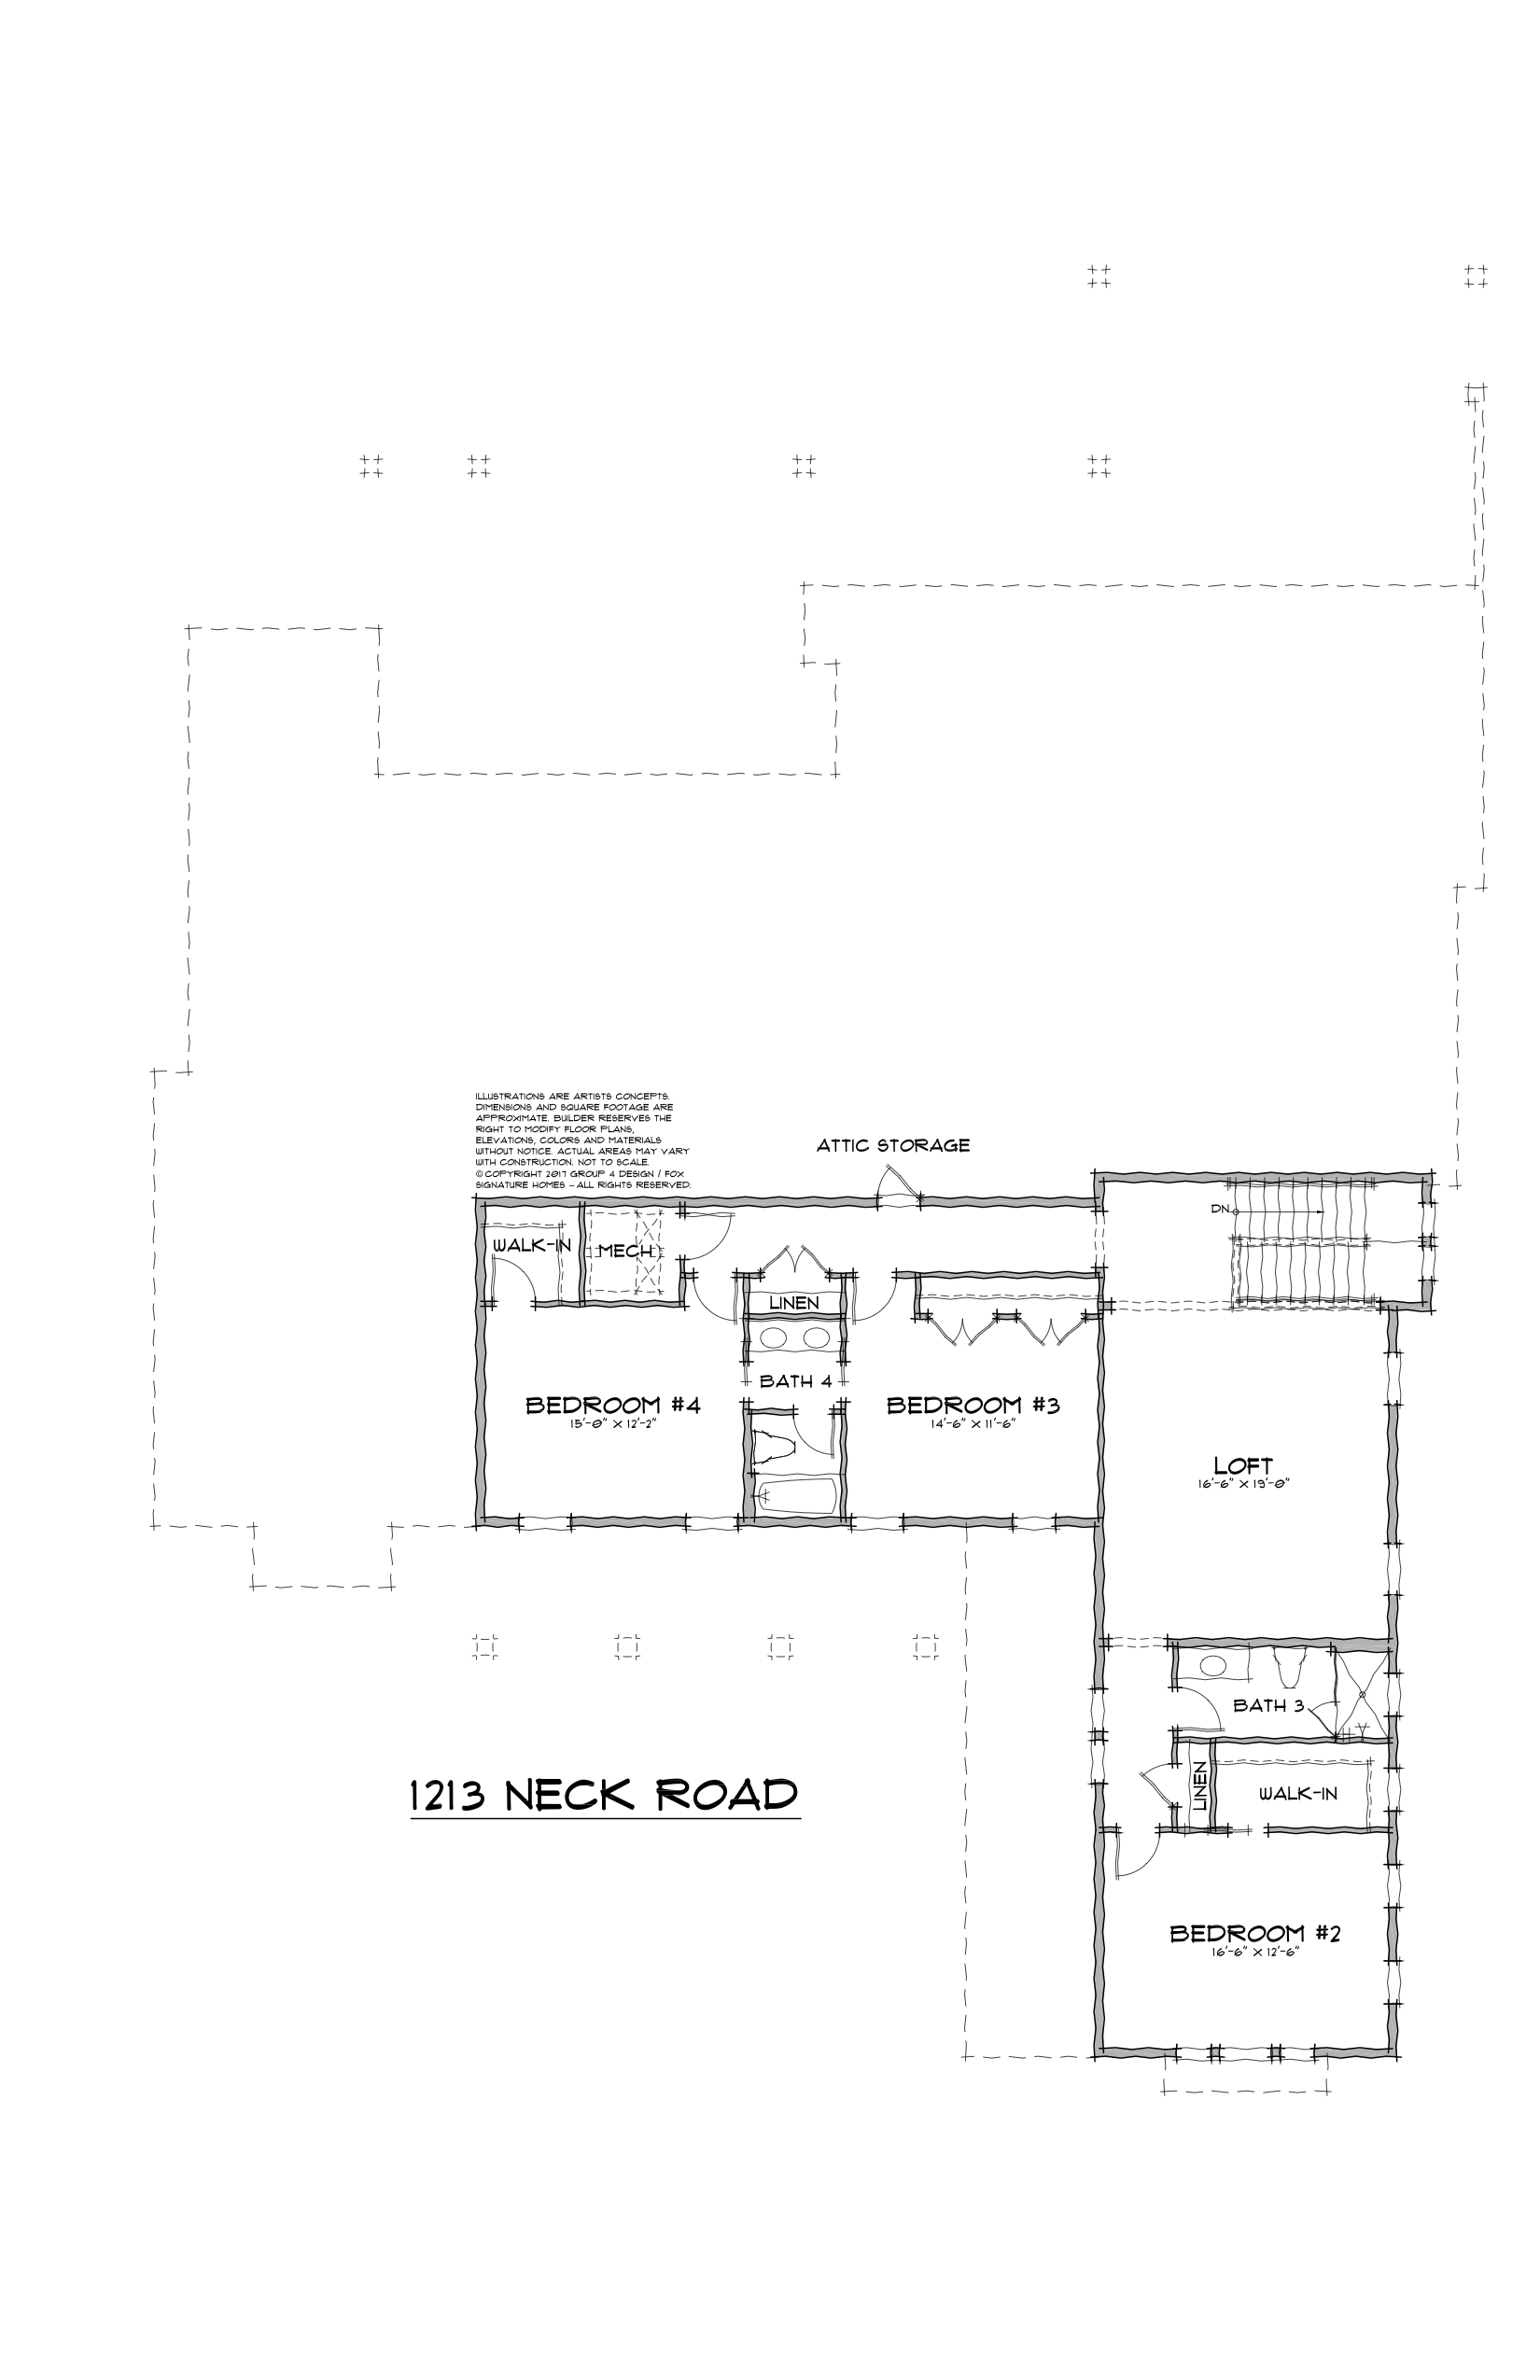 Neck Road Brochure 4-18-17 FL 2.jpg